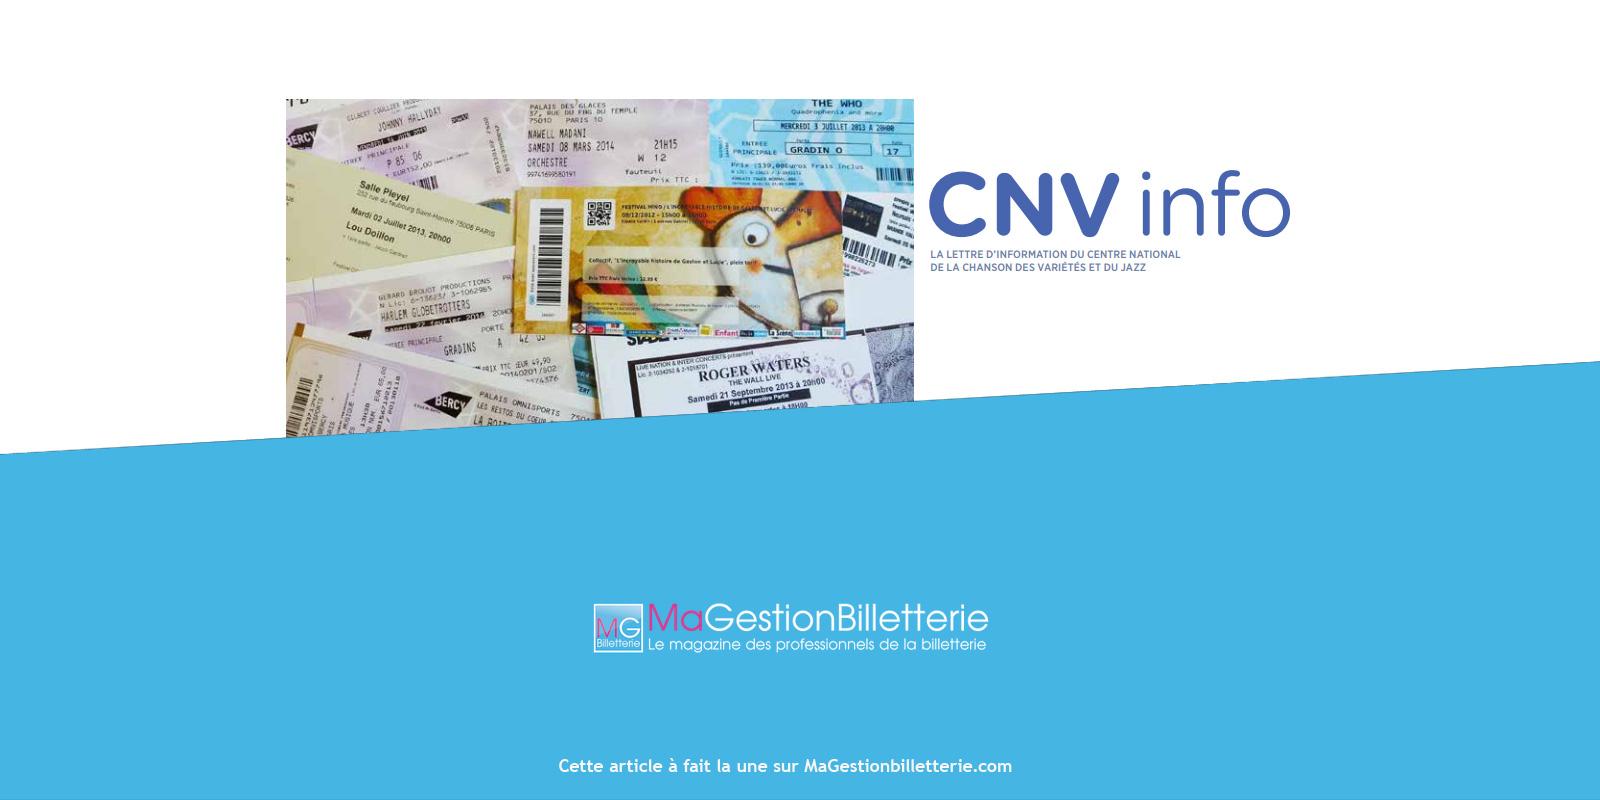 cnv-info-billetterie-juin2014-une2